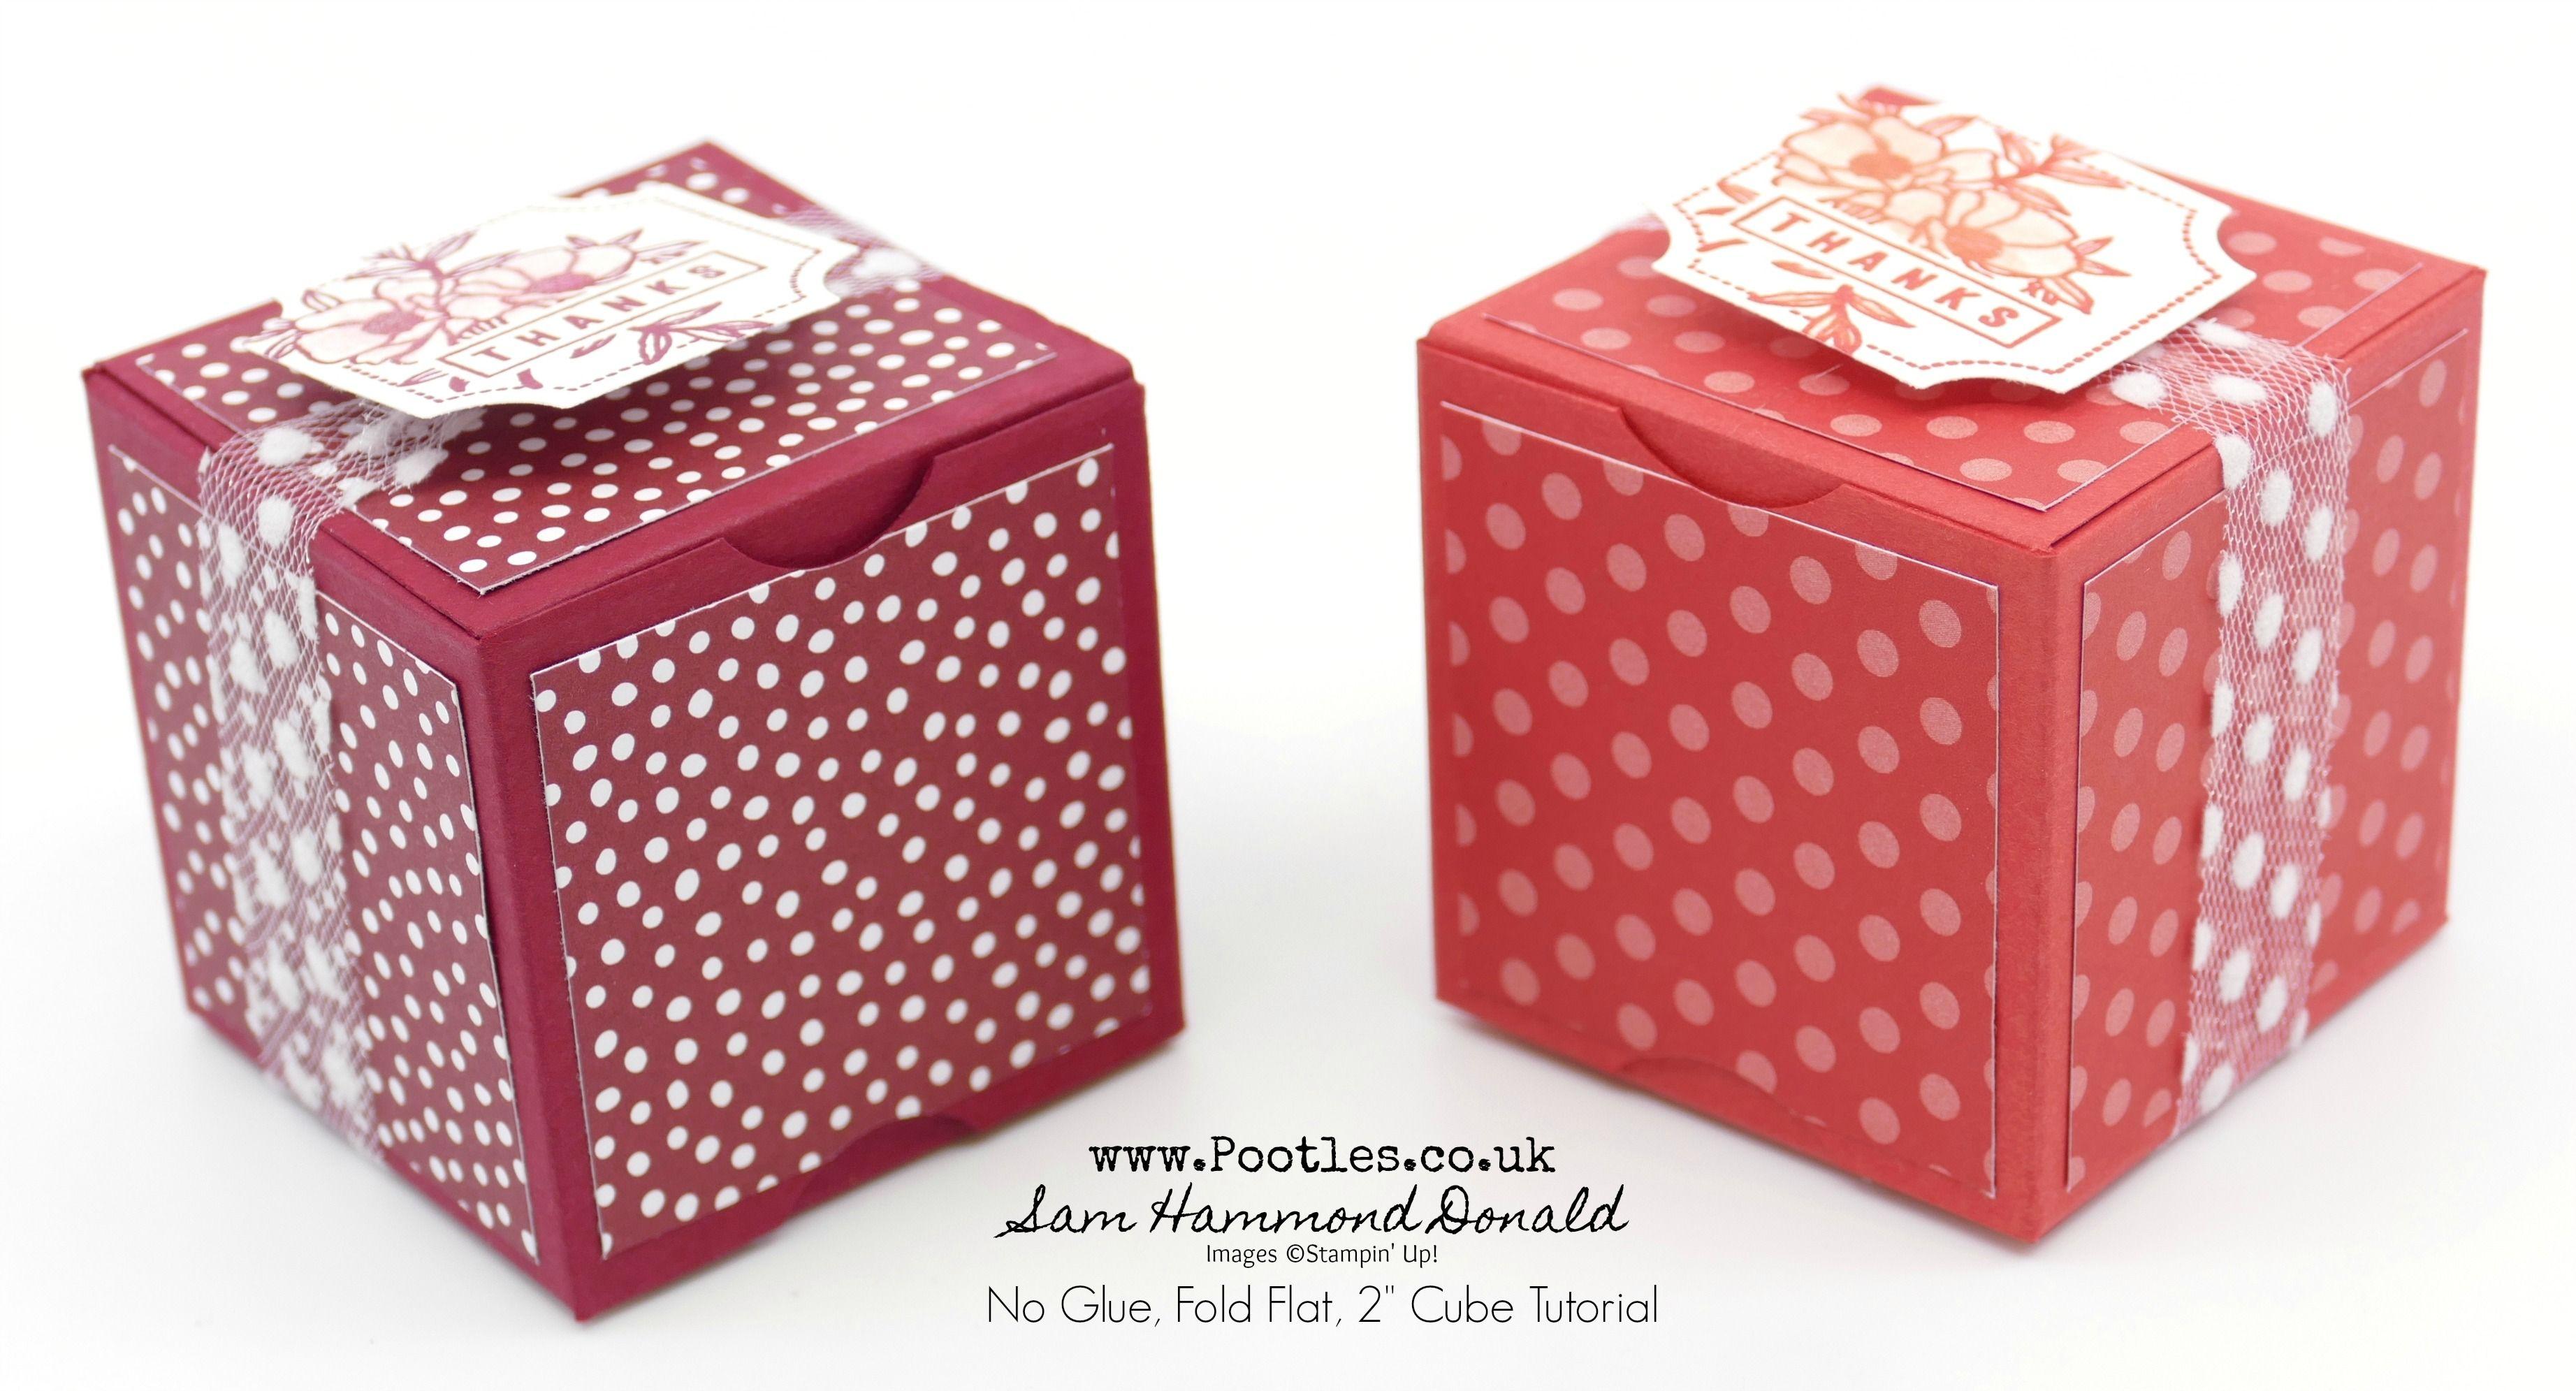 2 Inch Fold Flat No Glue Box Tutorial Scrapbook Box How To Make Box Treat Box Template